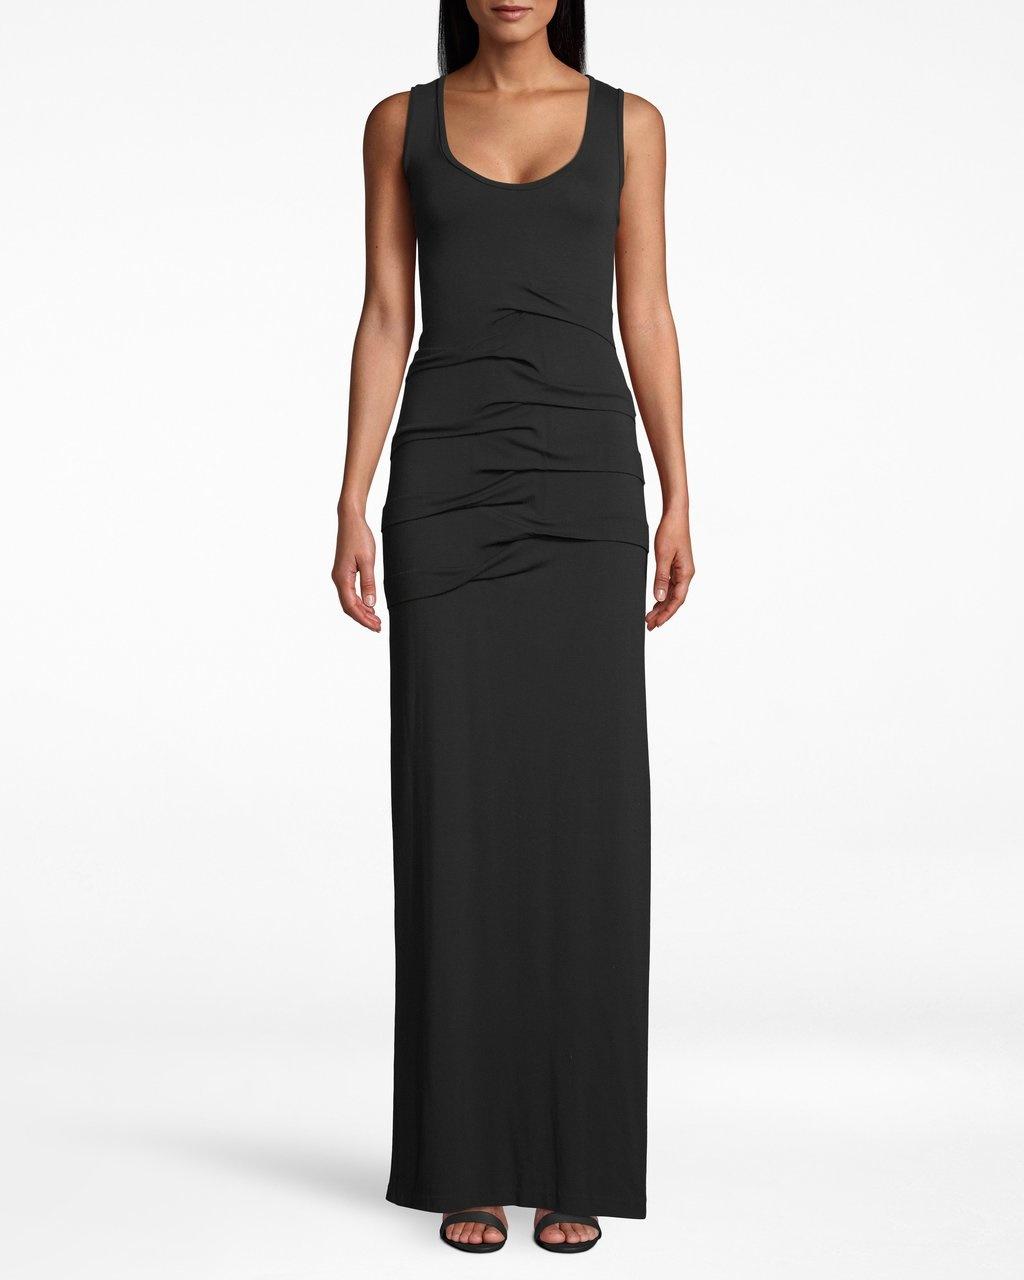 Nicole Miller Maxi Tidal Dress